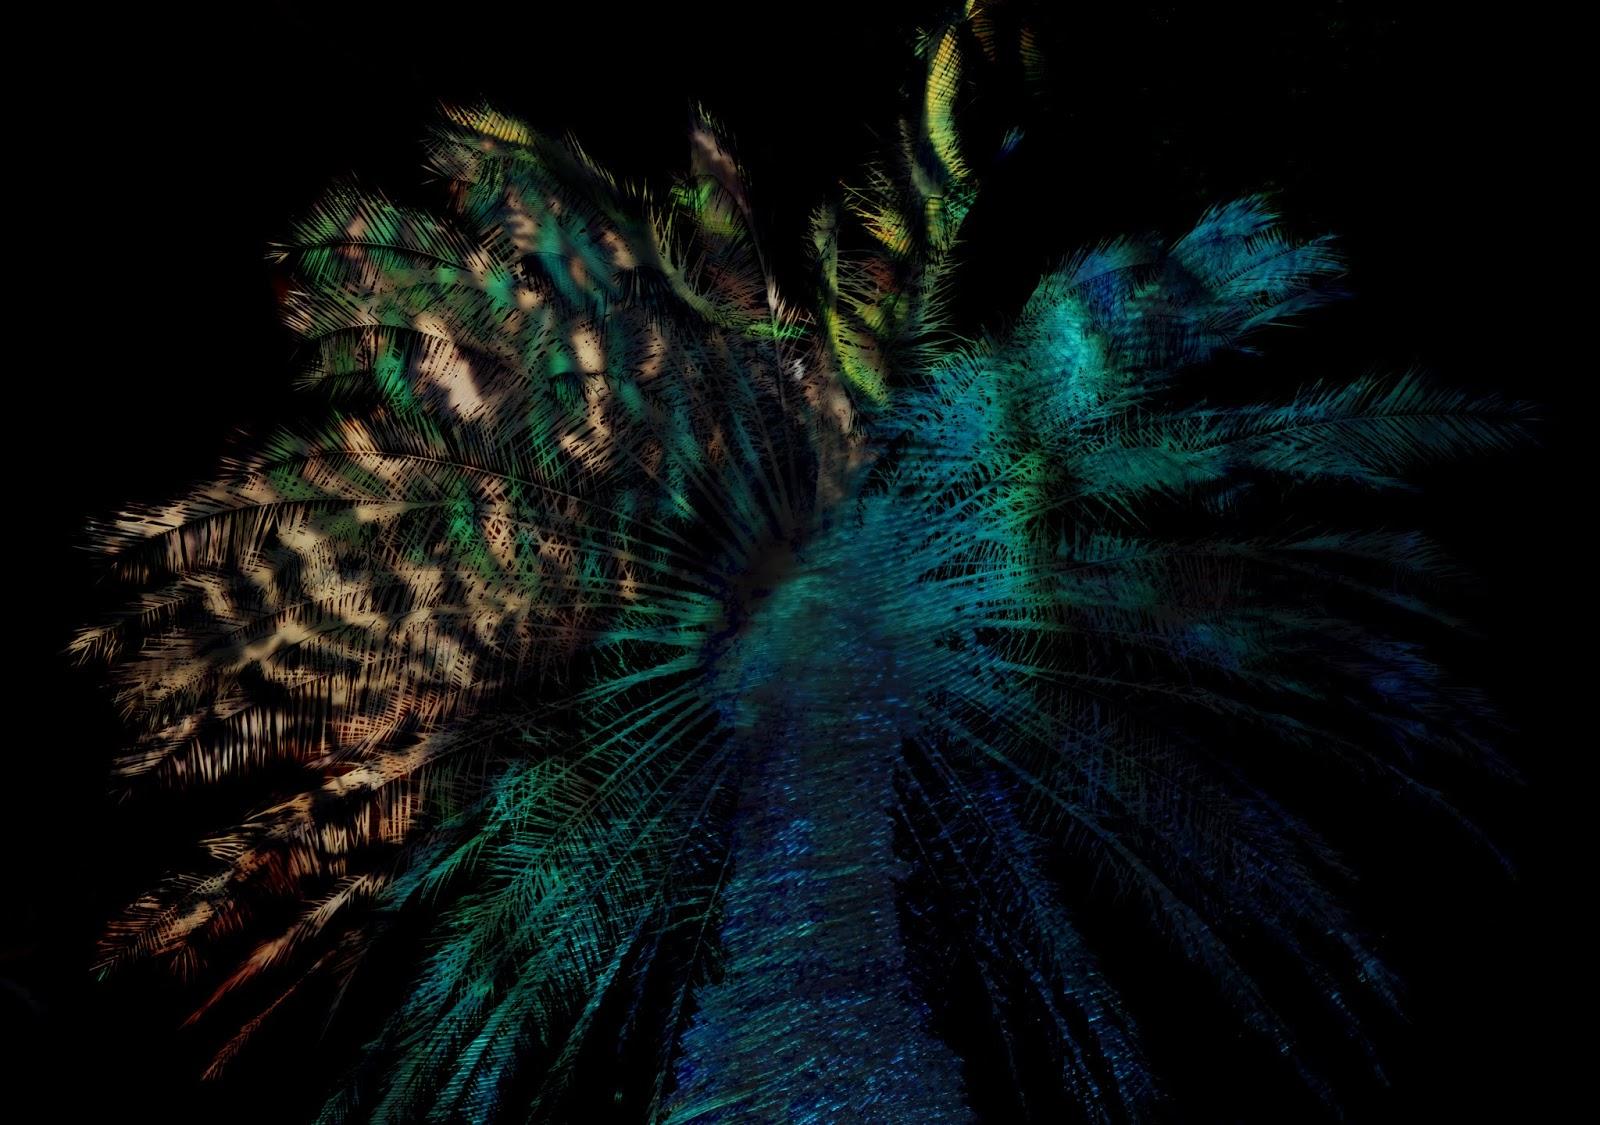 Rotorua Artist Janet Keen S Photography Mosaics Paintings Amp Writing